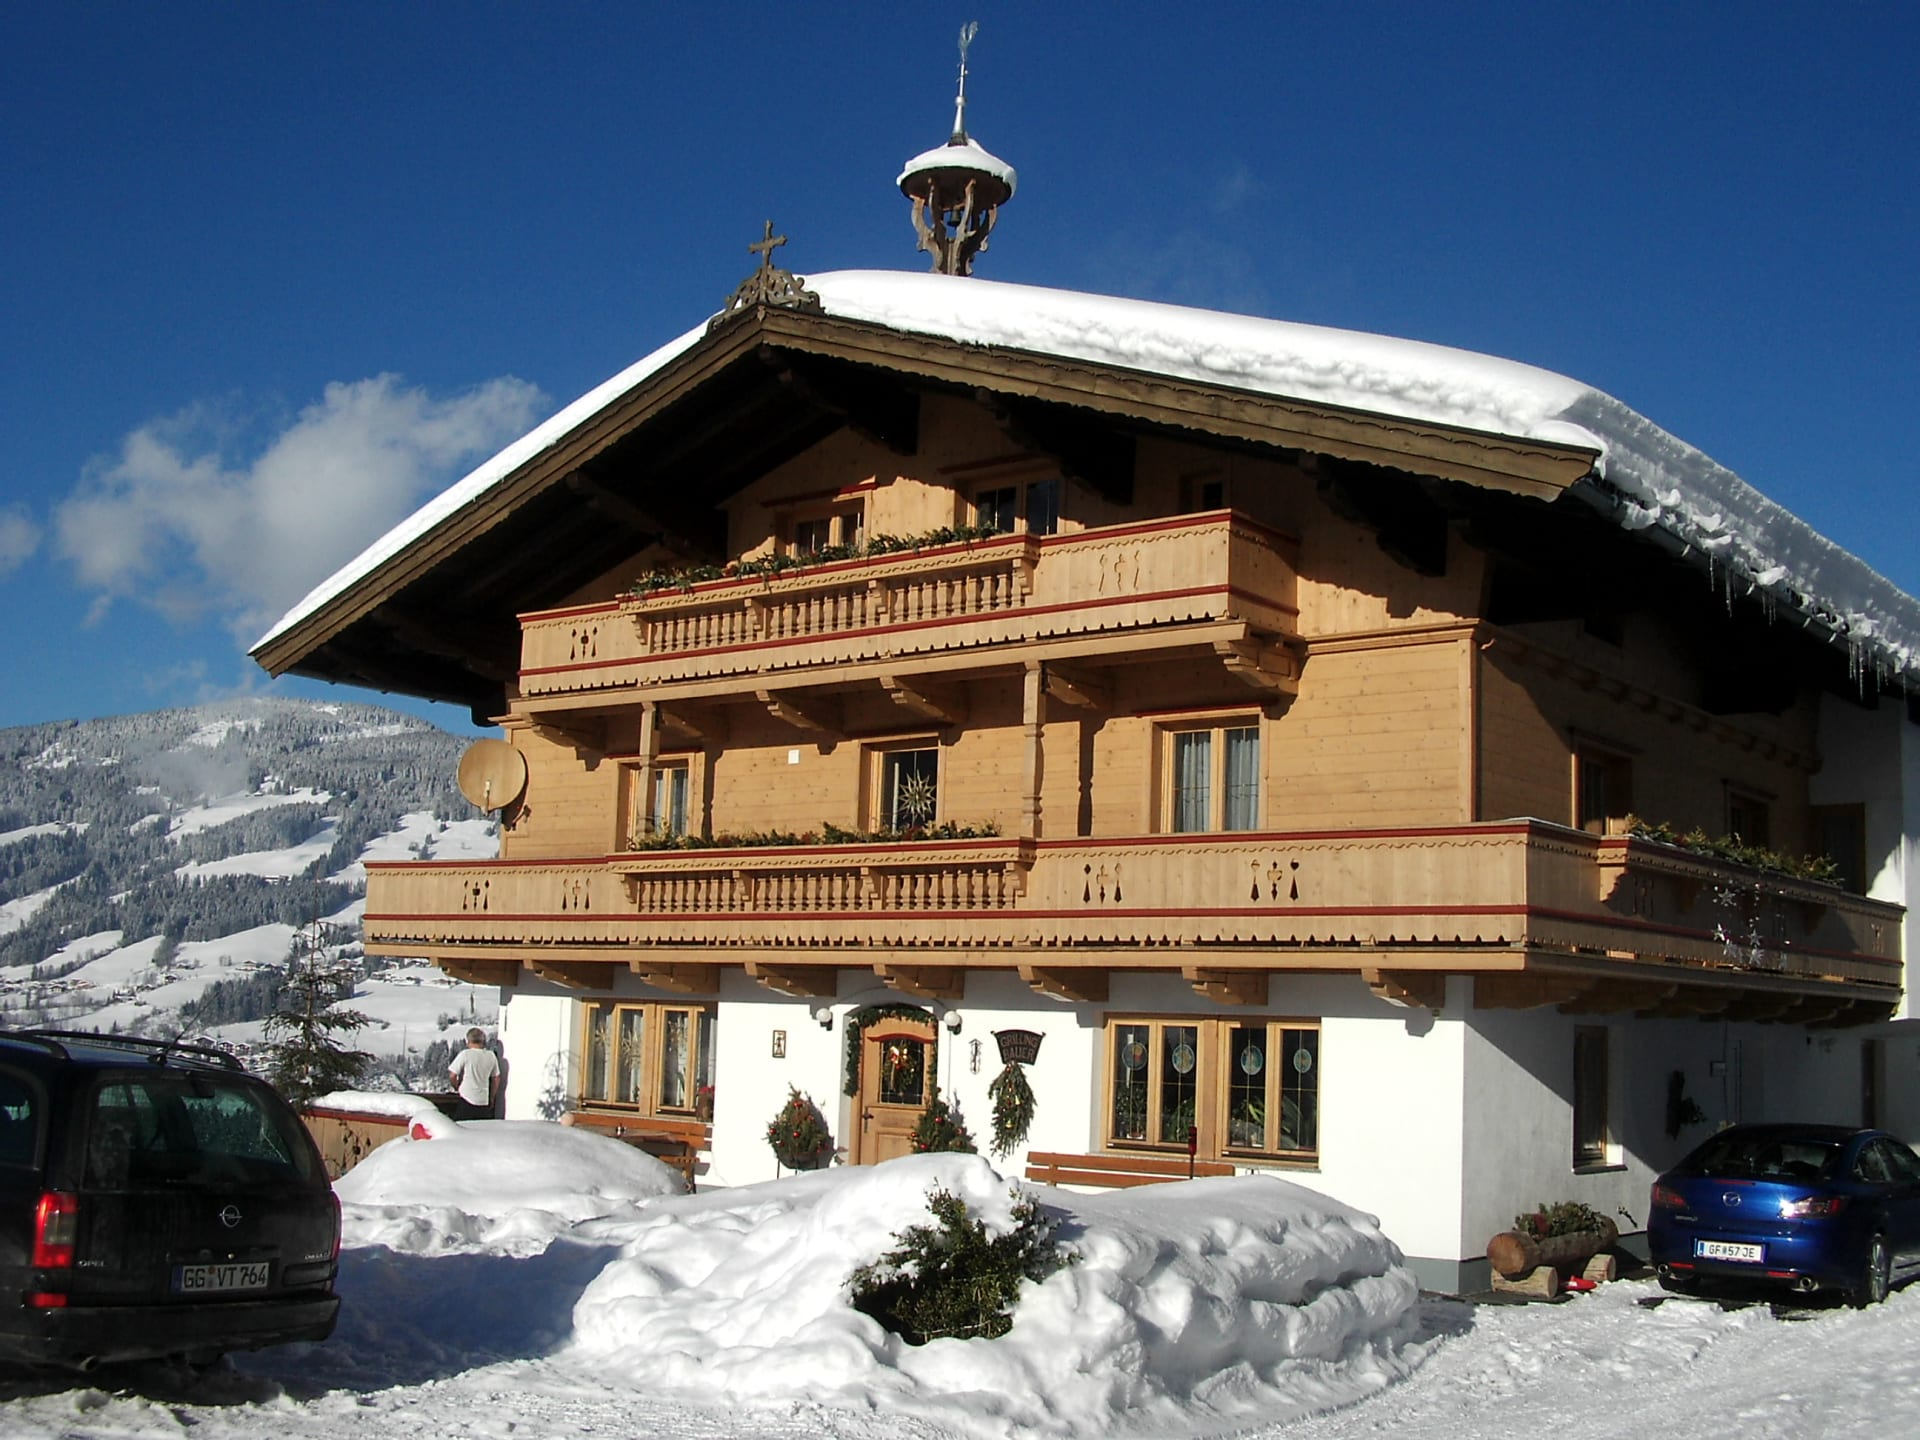 Grillinghof im Winter